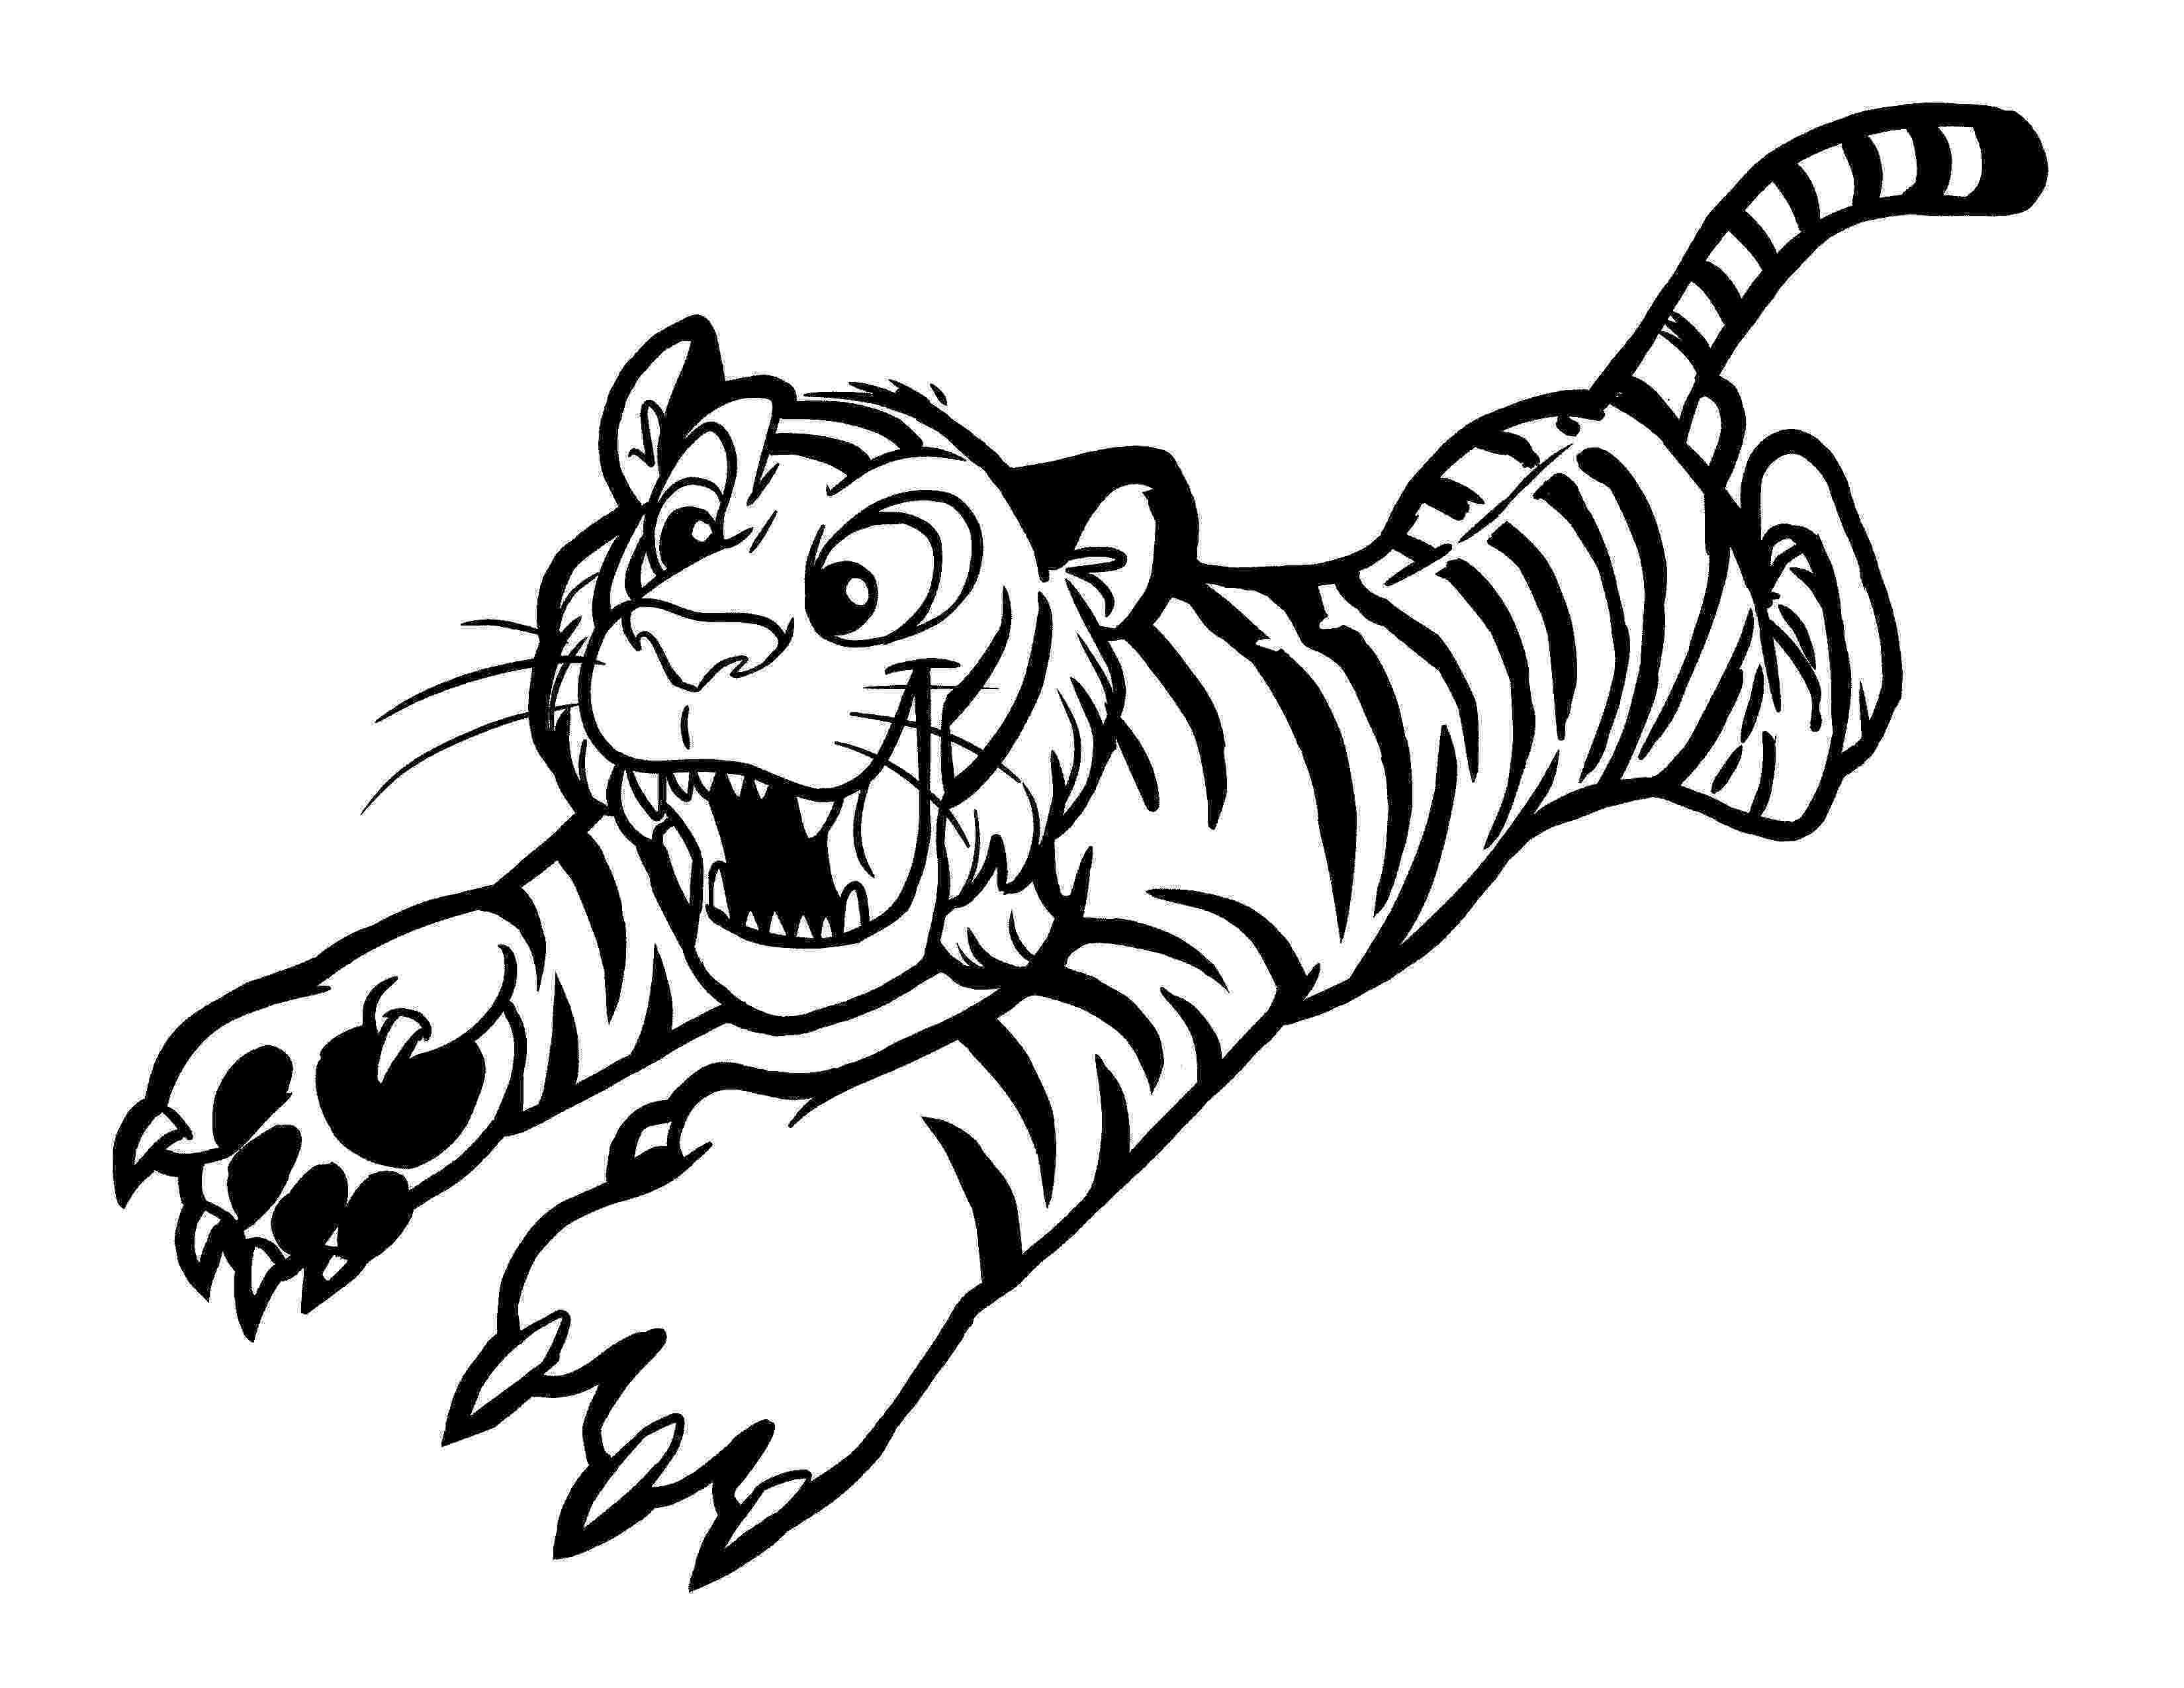 coloring page tiger free printable tiger coloring pages for kids page coloring tiger